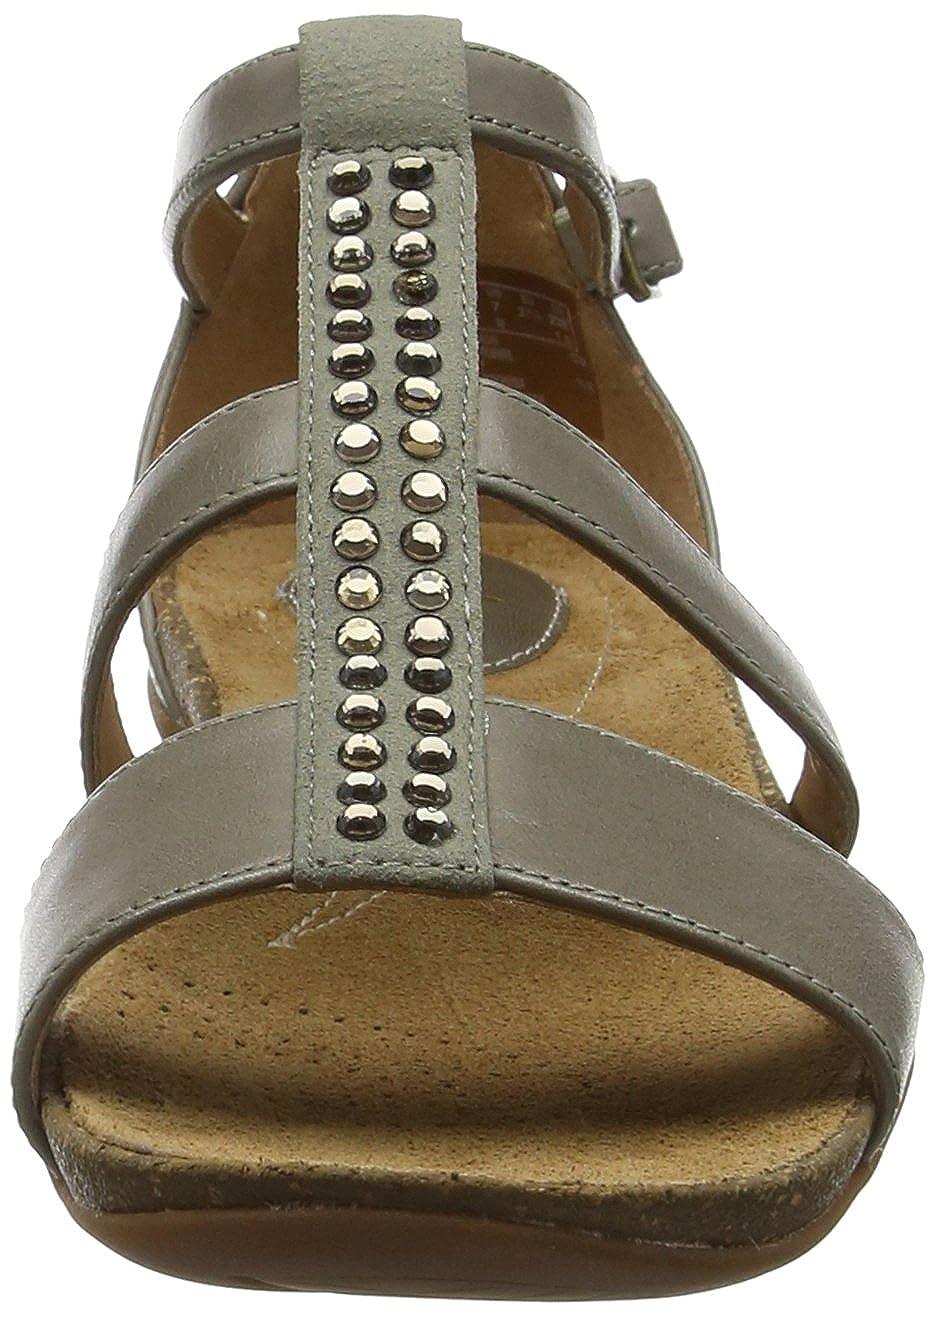 Mr.   Ms. Clarks Clarks Clarks 261243694, Sandali Donna Louis, elaborato Stile elegante Stile eccezionale | On-line  6420f4